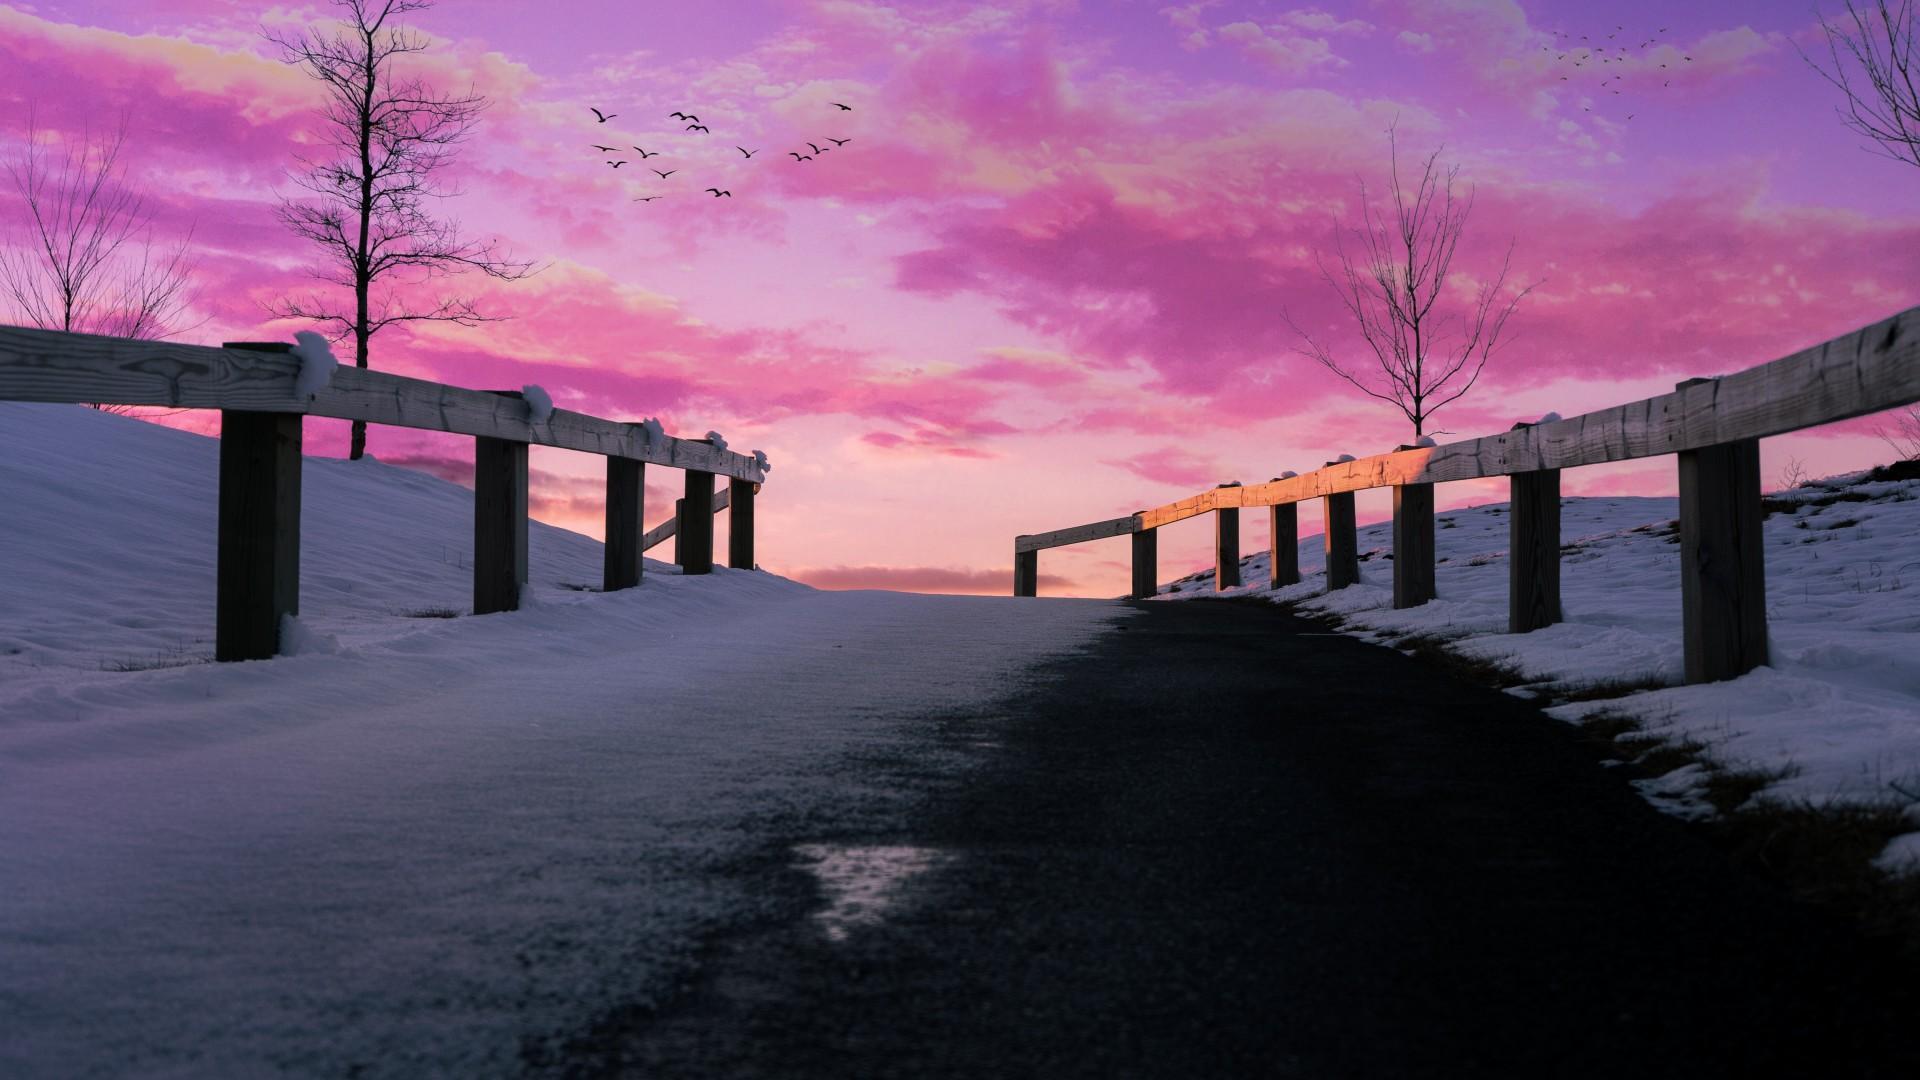 Sky Aesthetic Hd 1080p Wallpapers - Wallpaper Cave